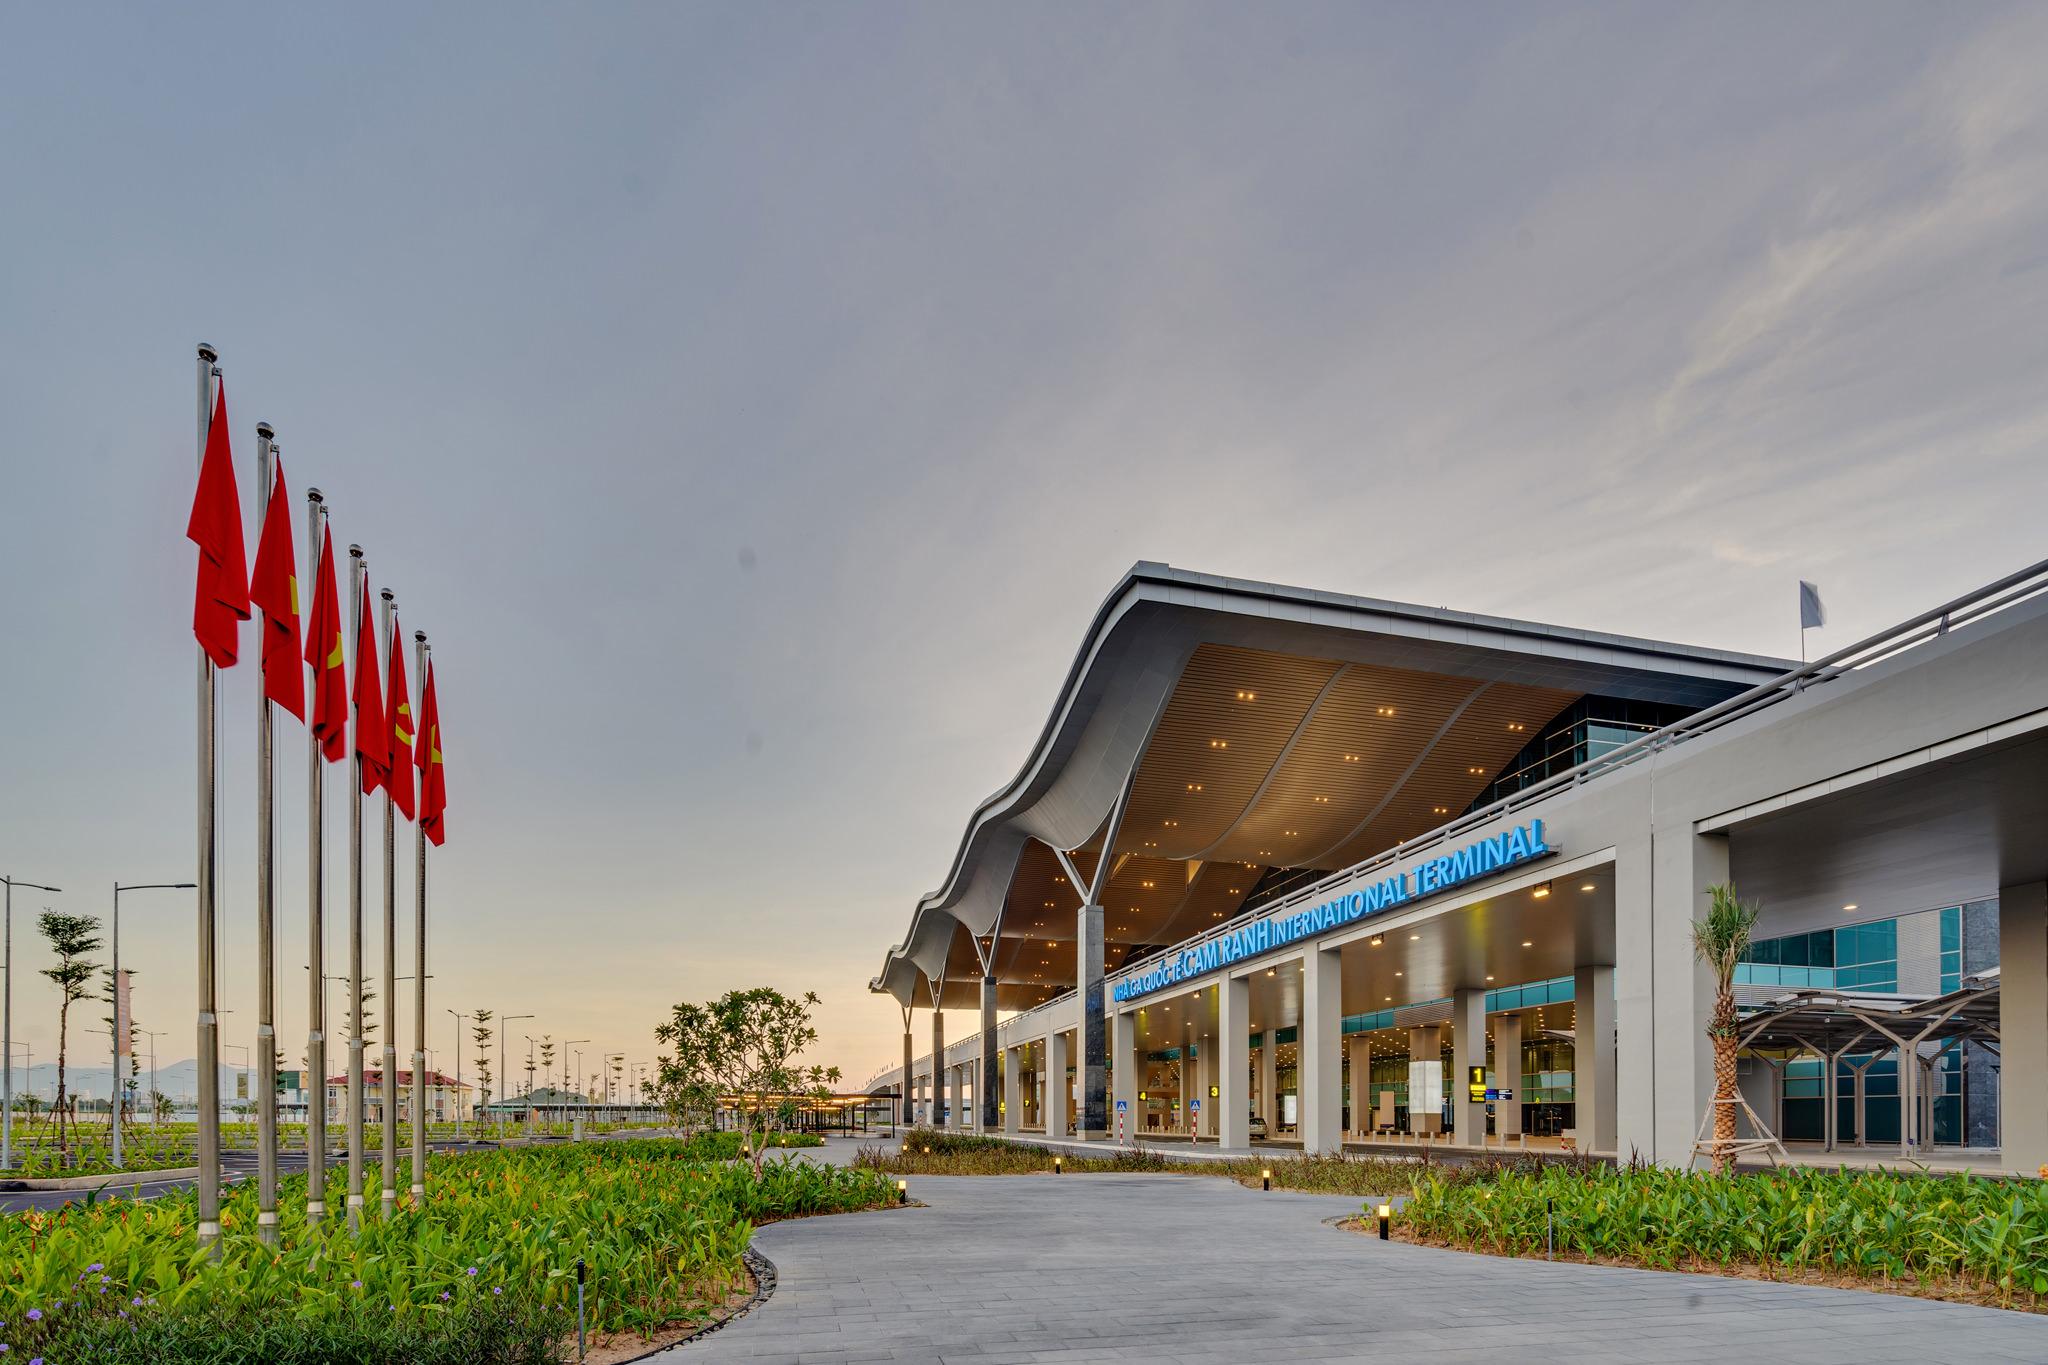 20180626 - Cam Ranh Airport - Architecture - 0018.jpg